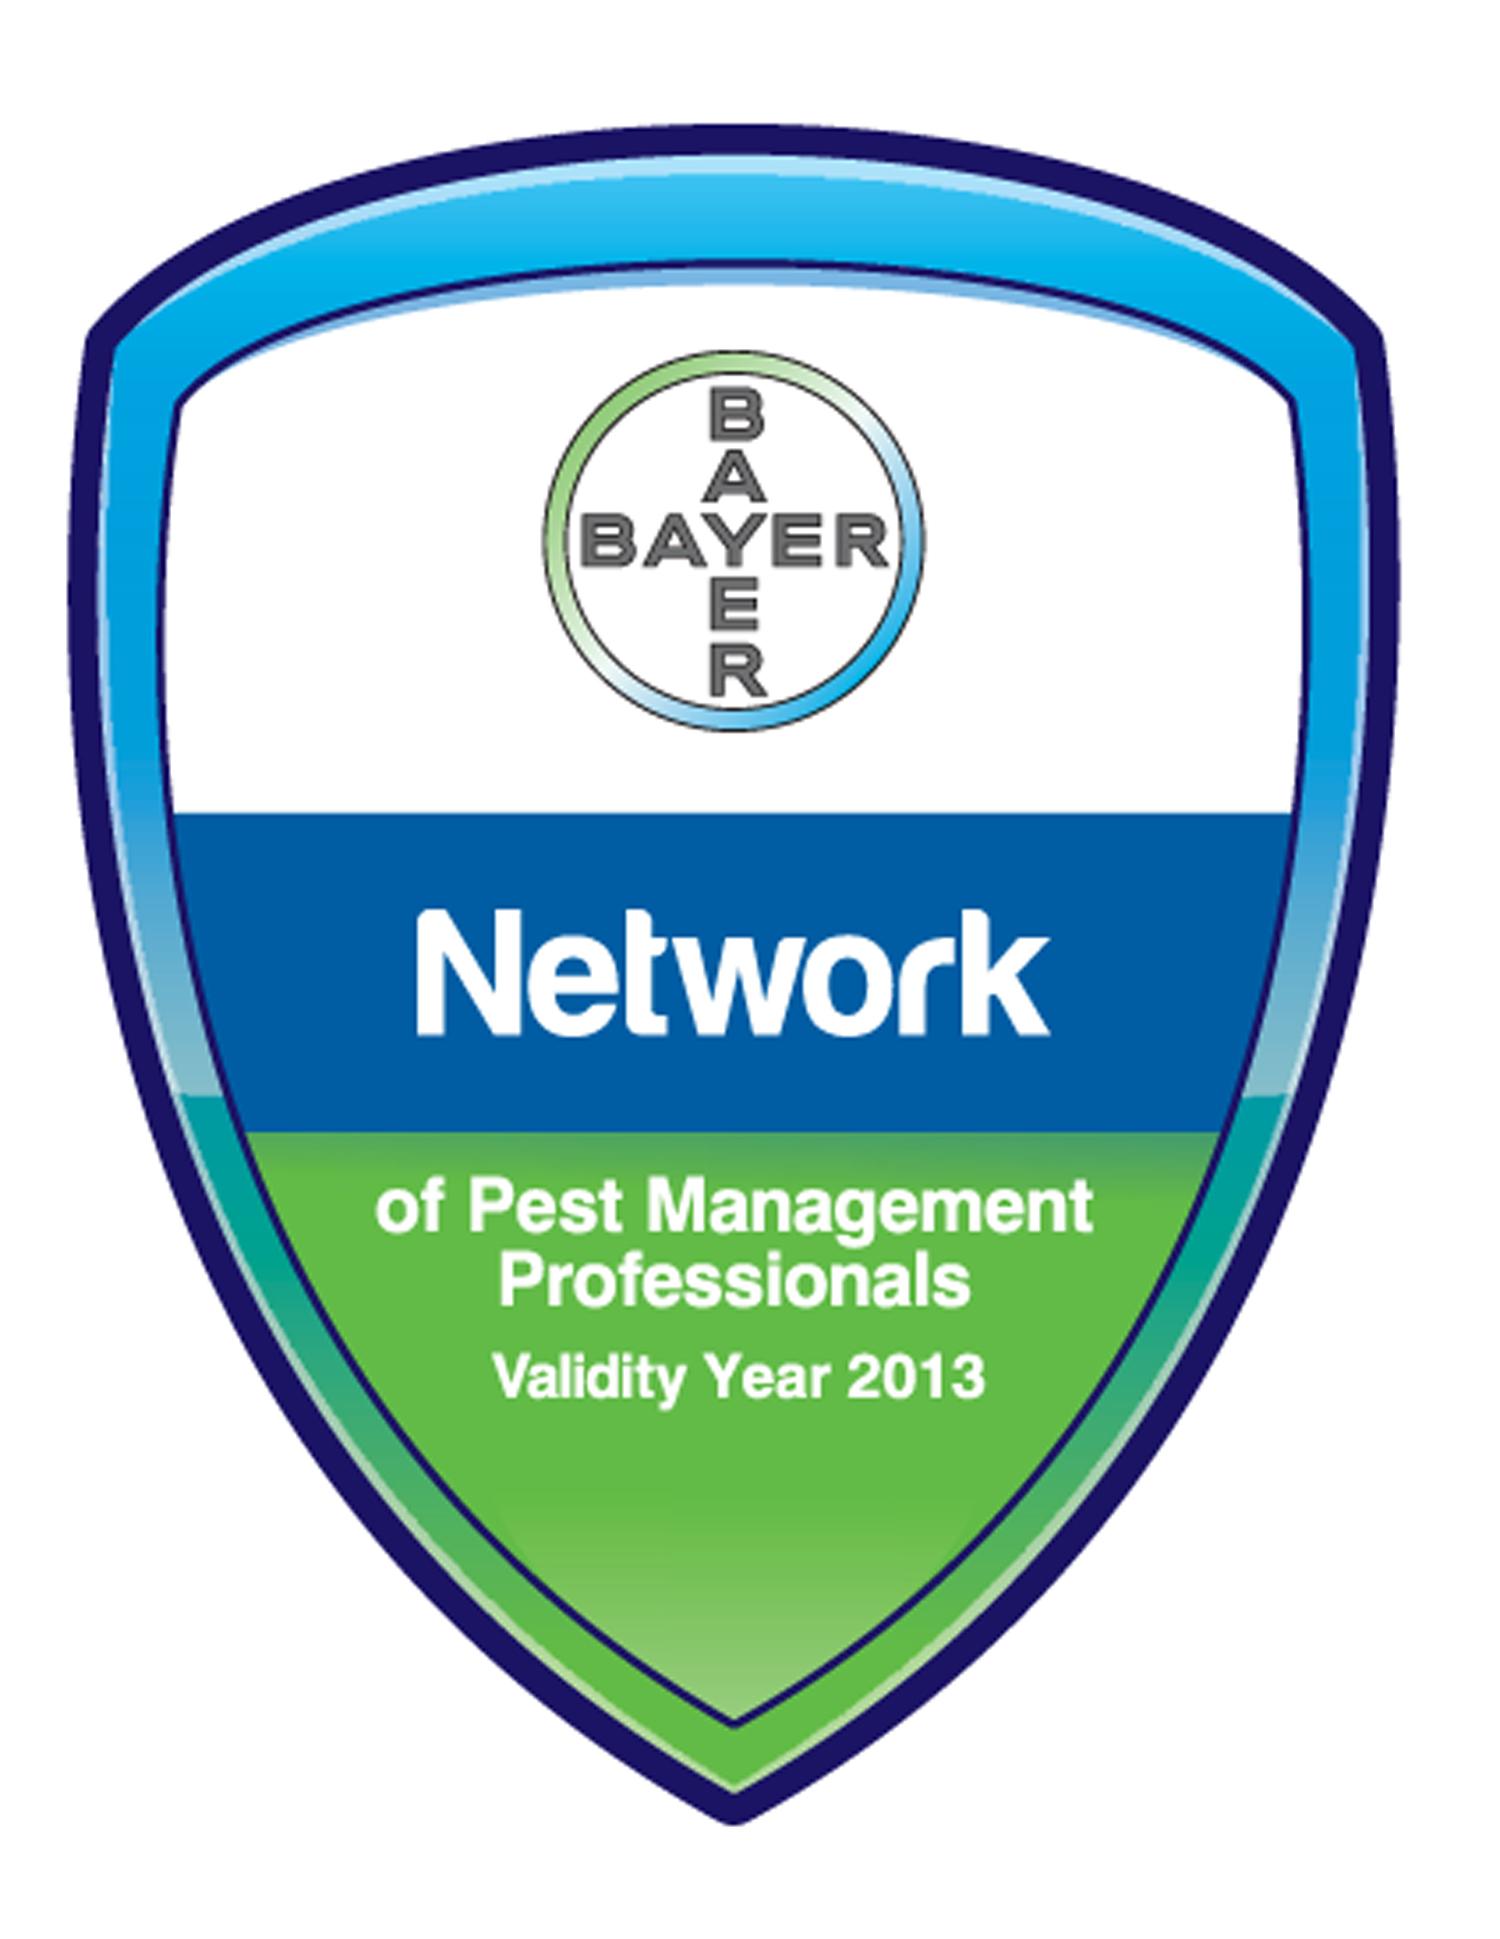 We Control Pest Control Services